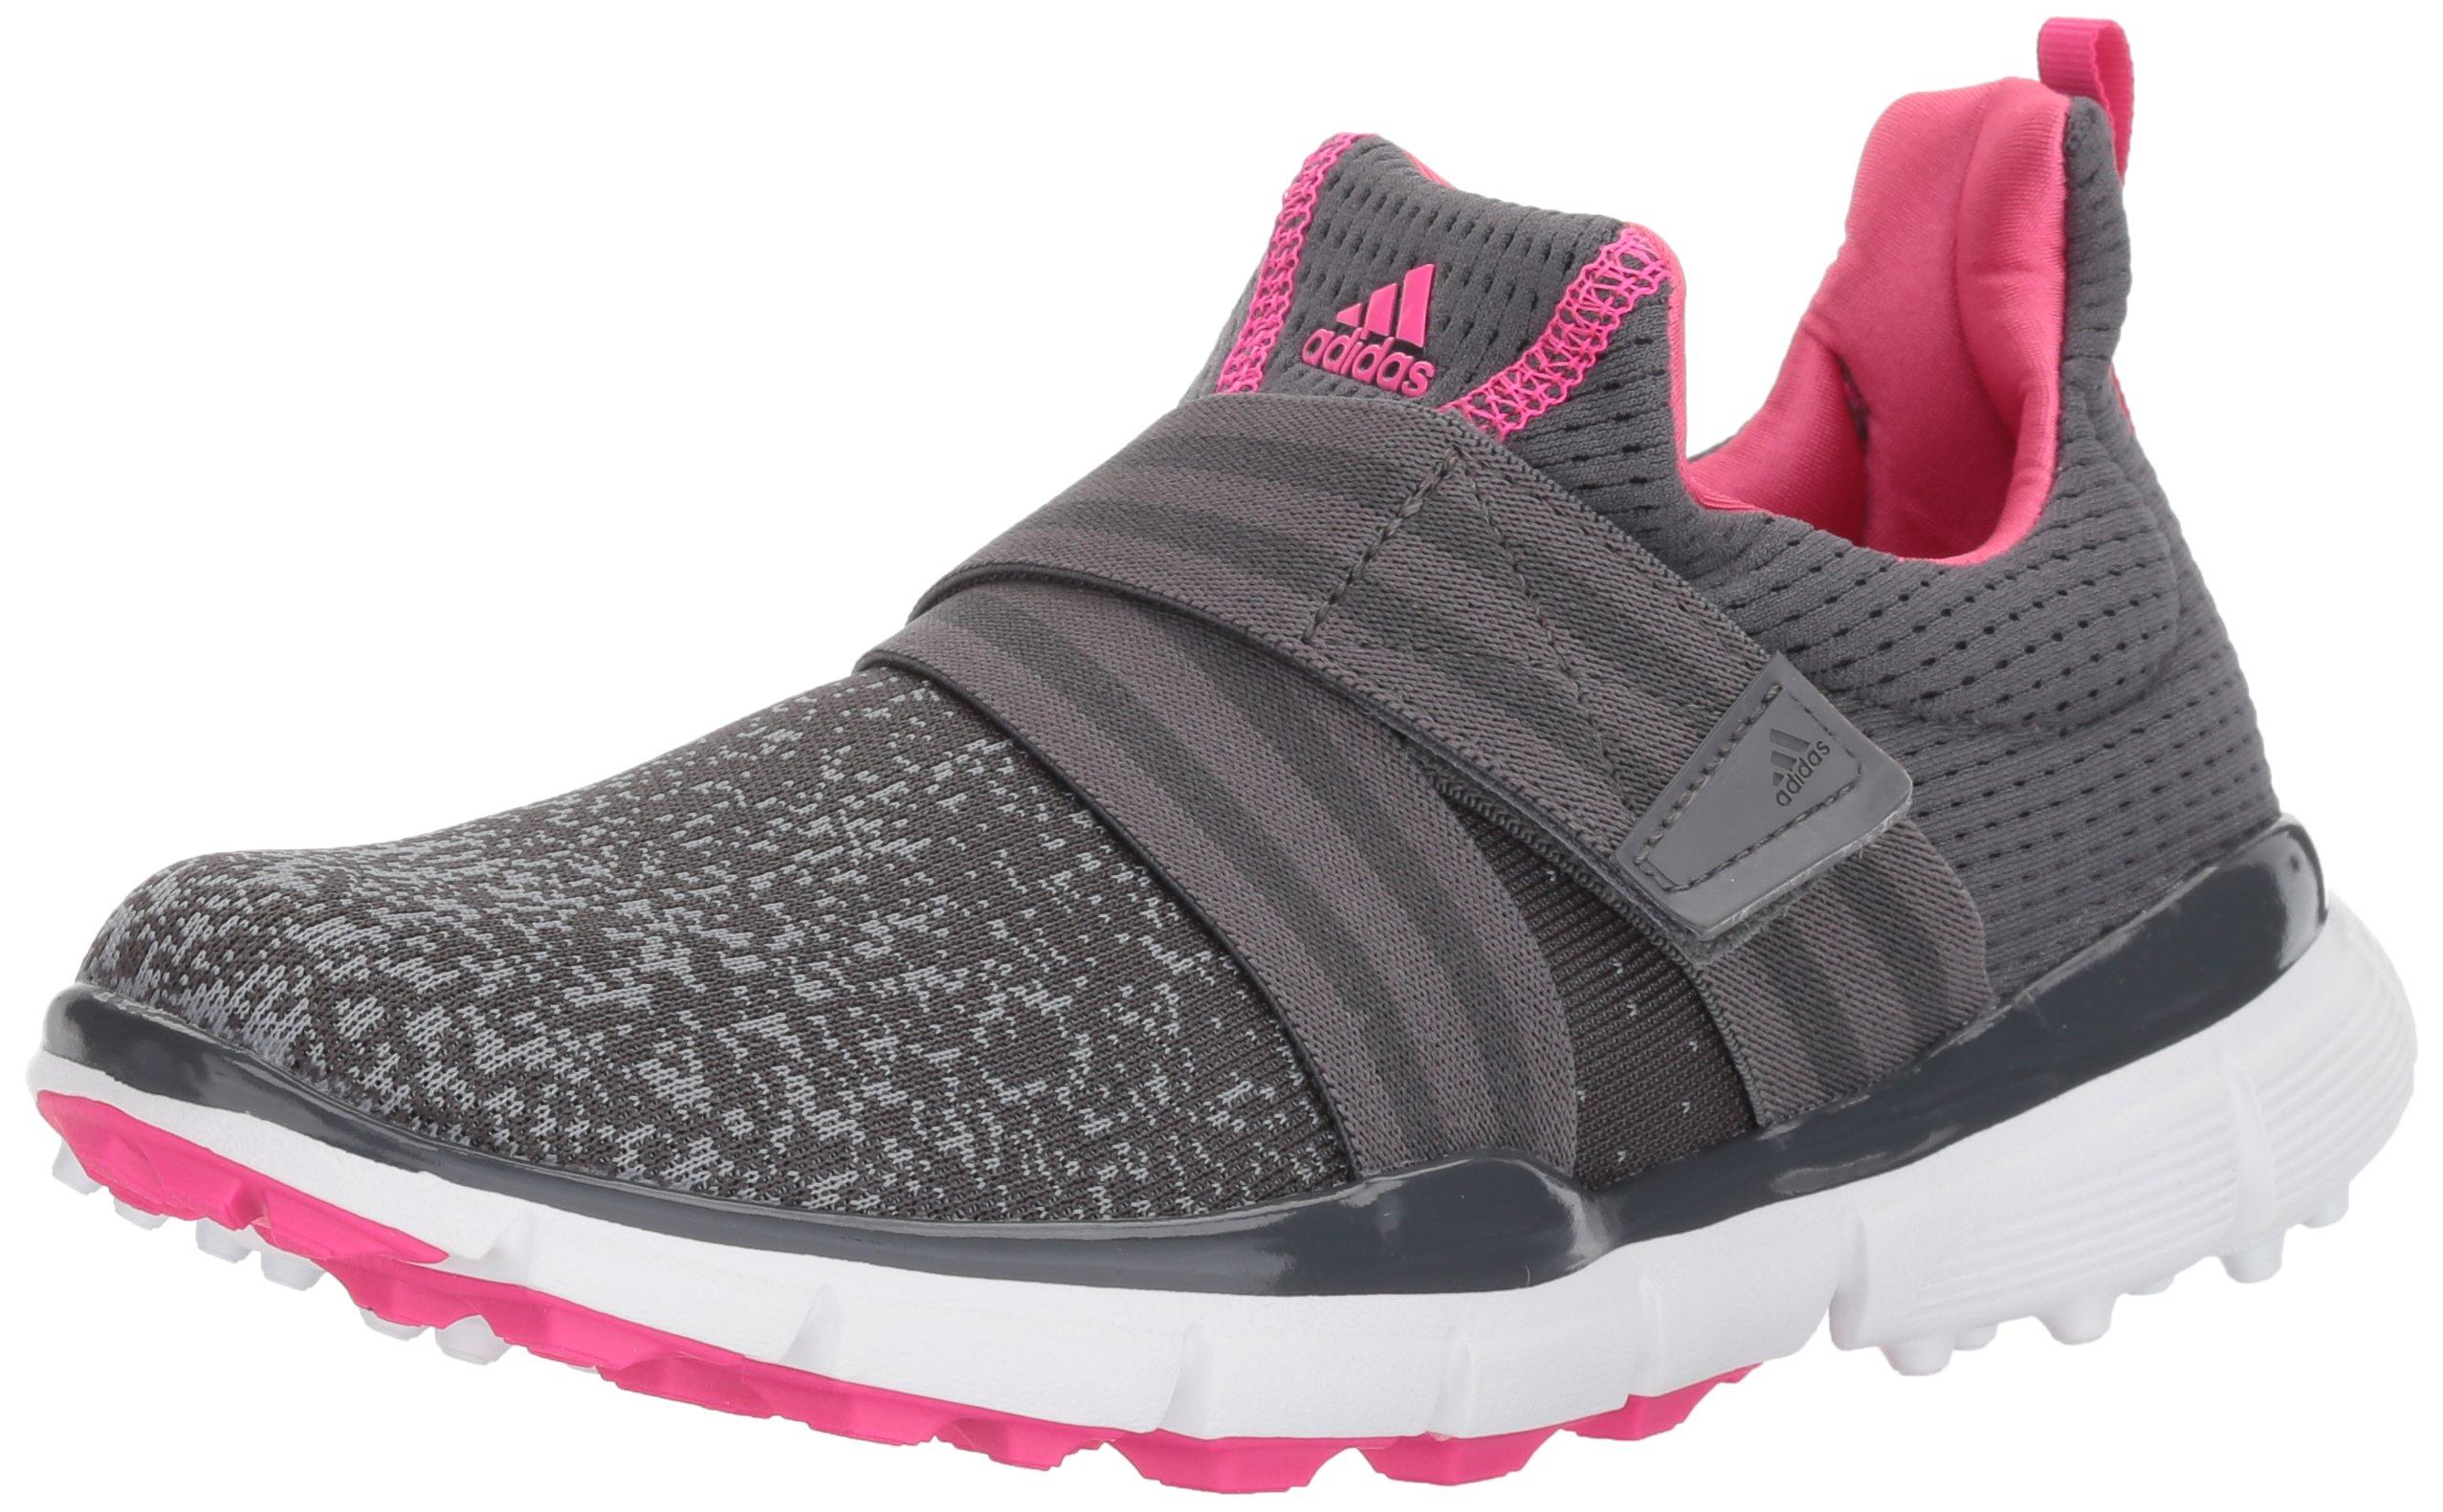 adidas Women's W Climacool Knit Golf Shoe, Grey Five Grey Four Shock Pink S, 10 M US by adidas